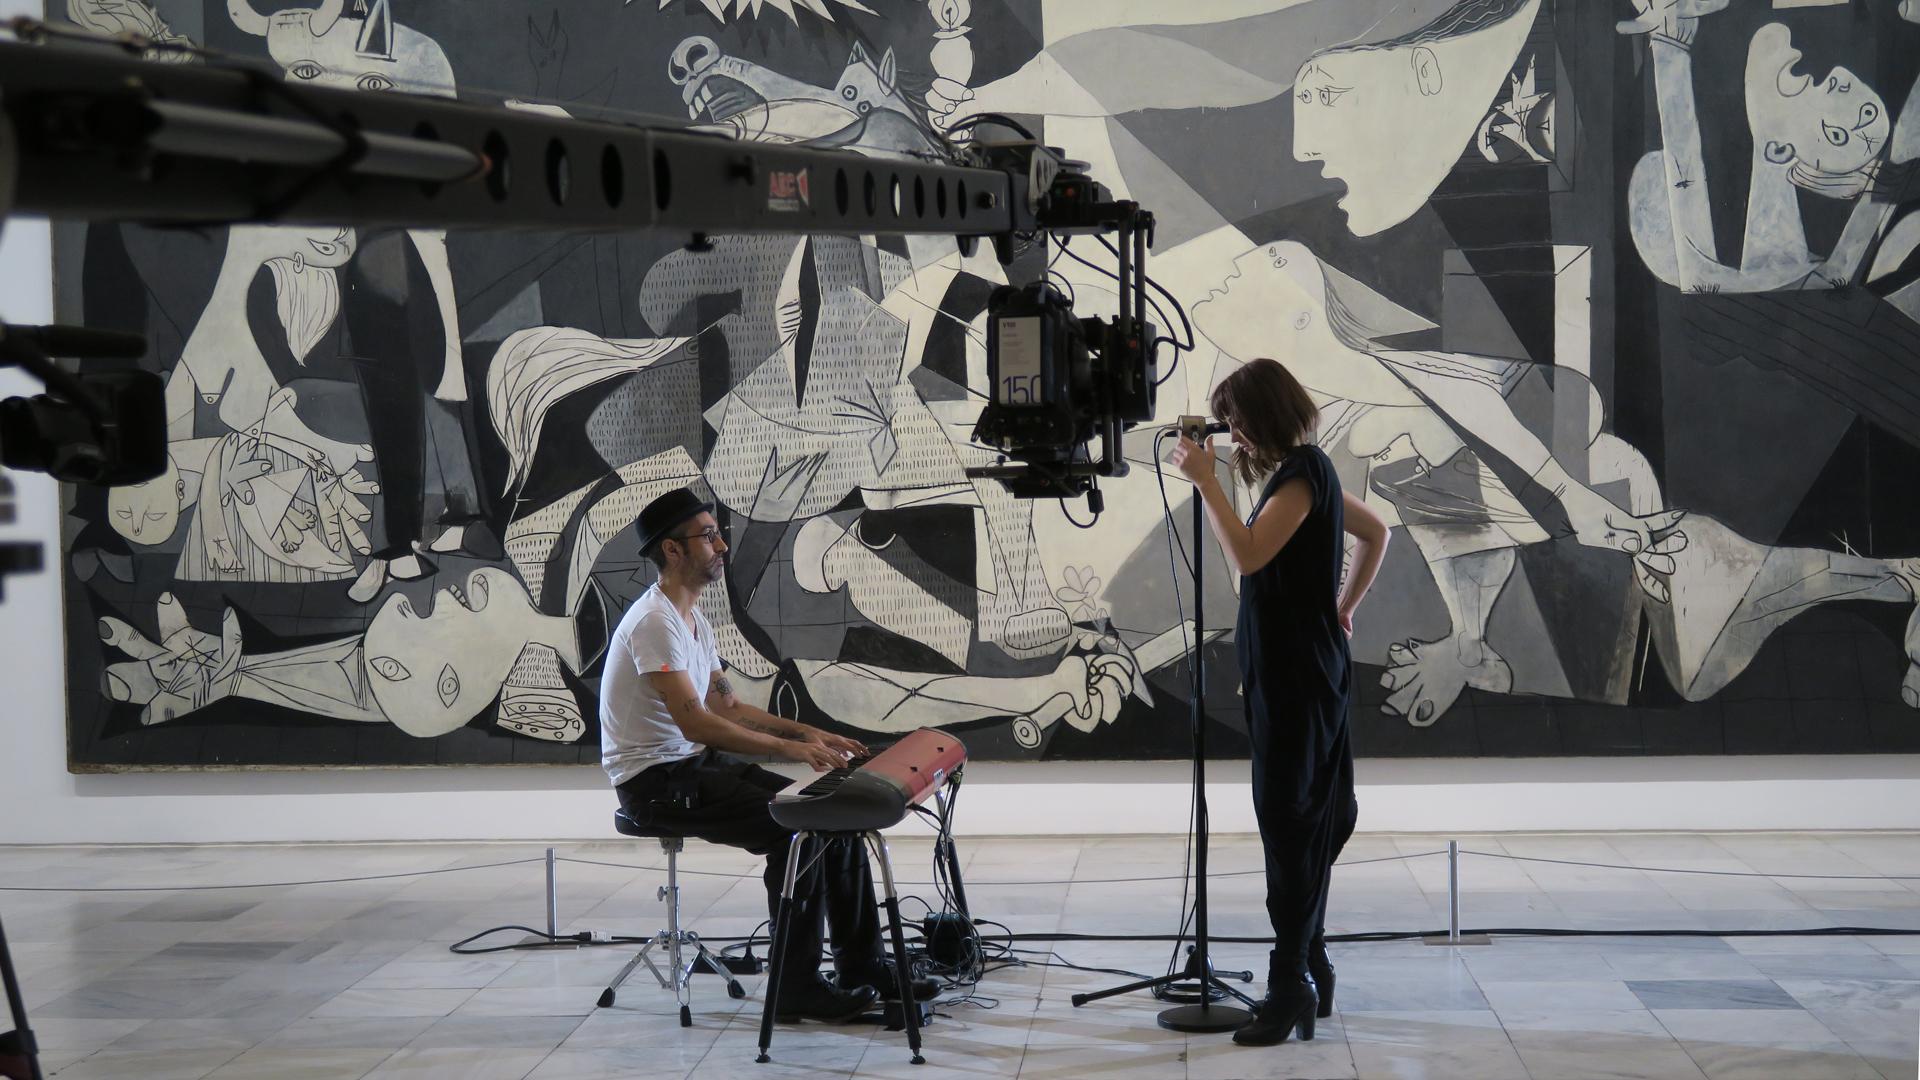 Suena Guernica - Marlango, 'Ay, pena, penita, pena' (Teaser) - 21/04/17